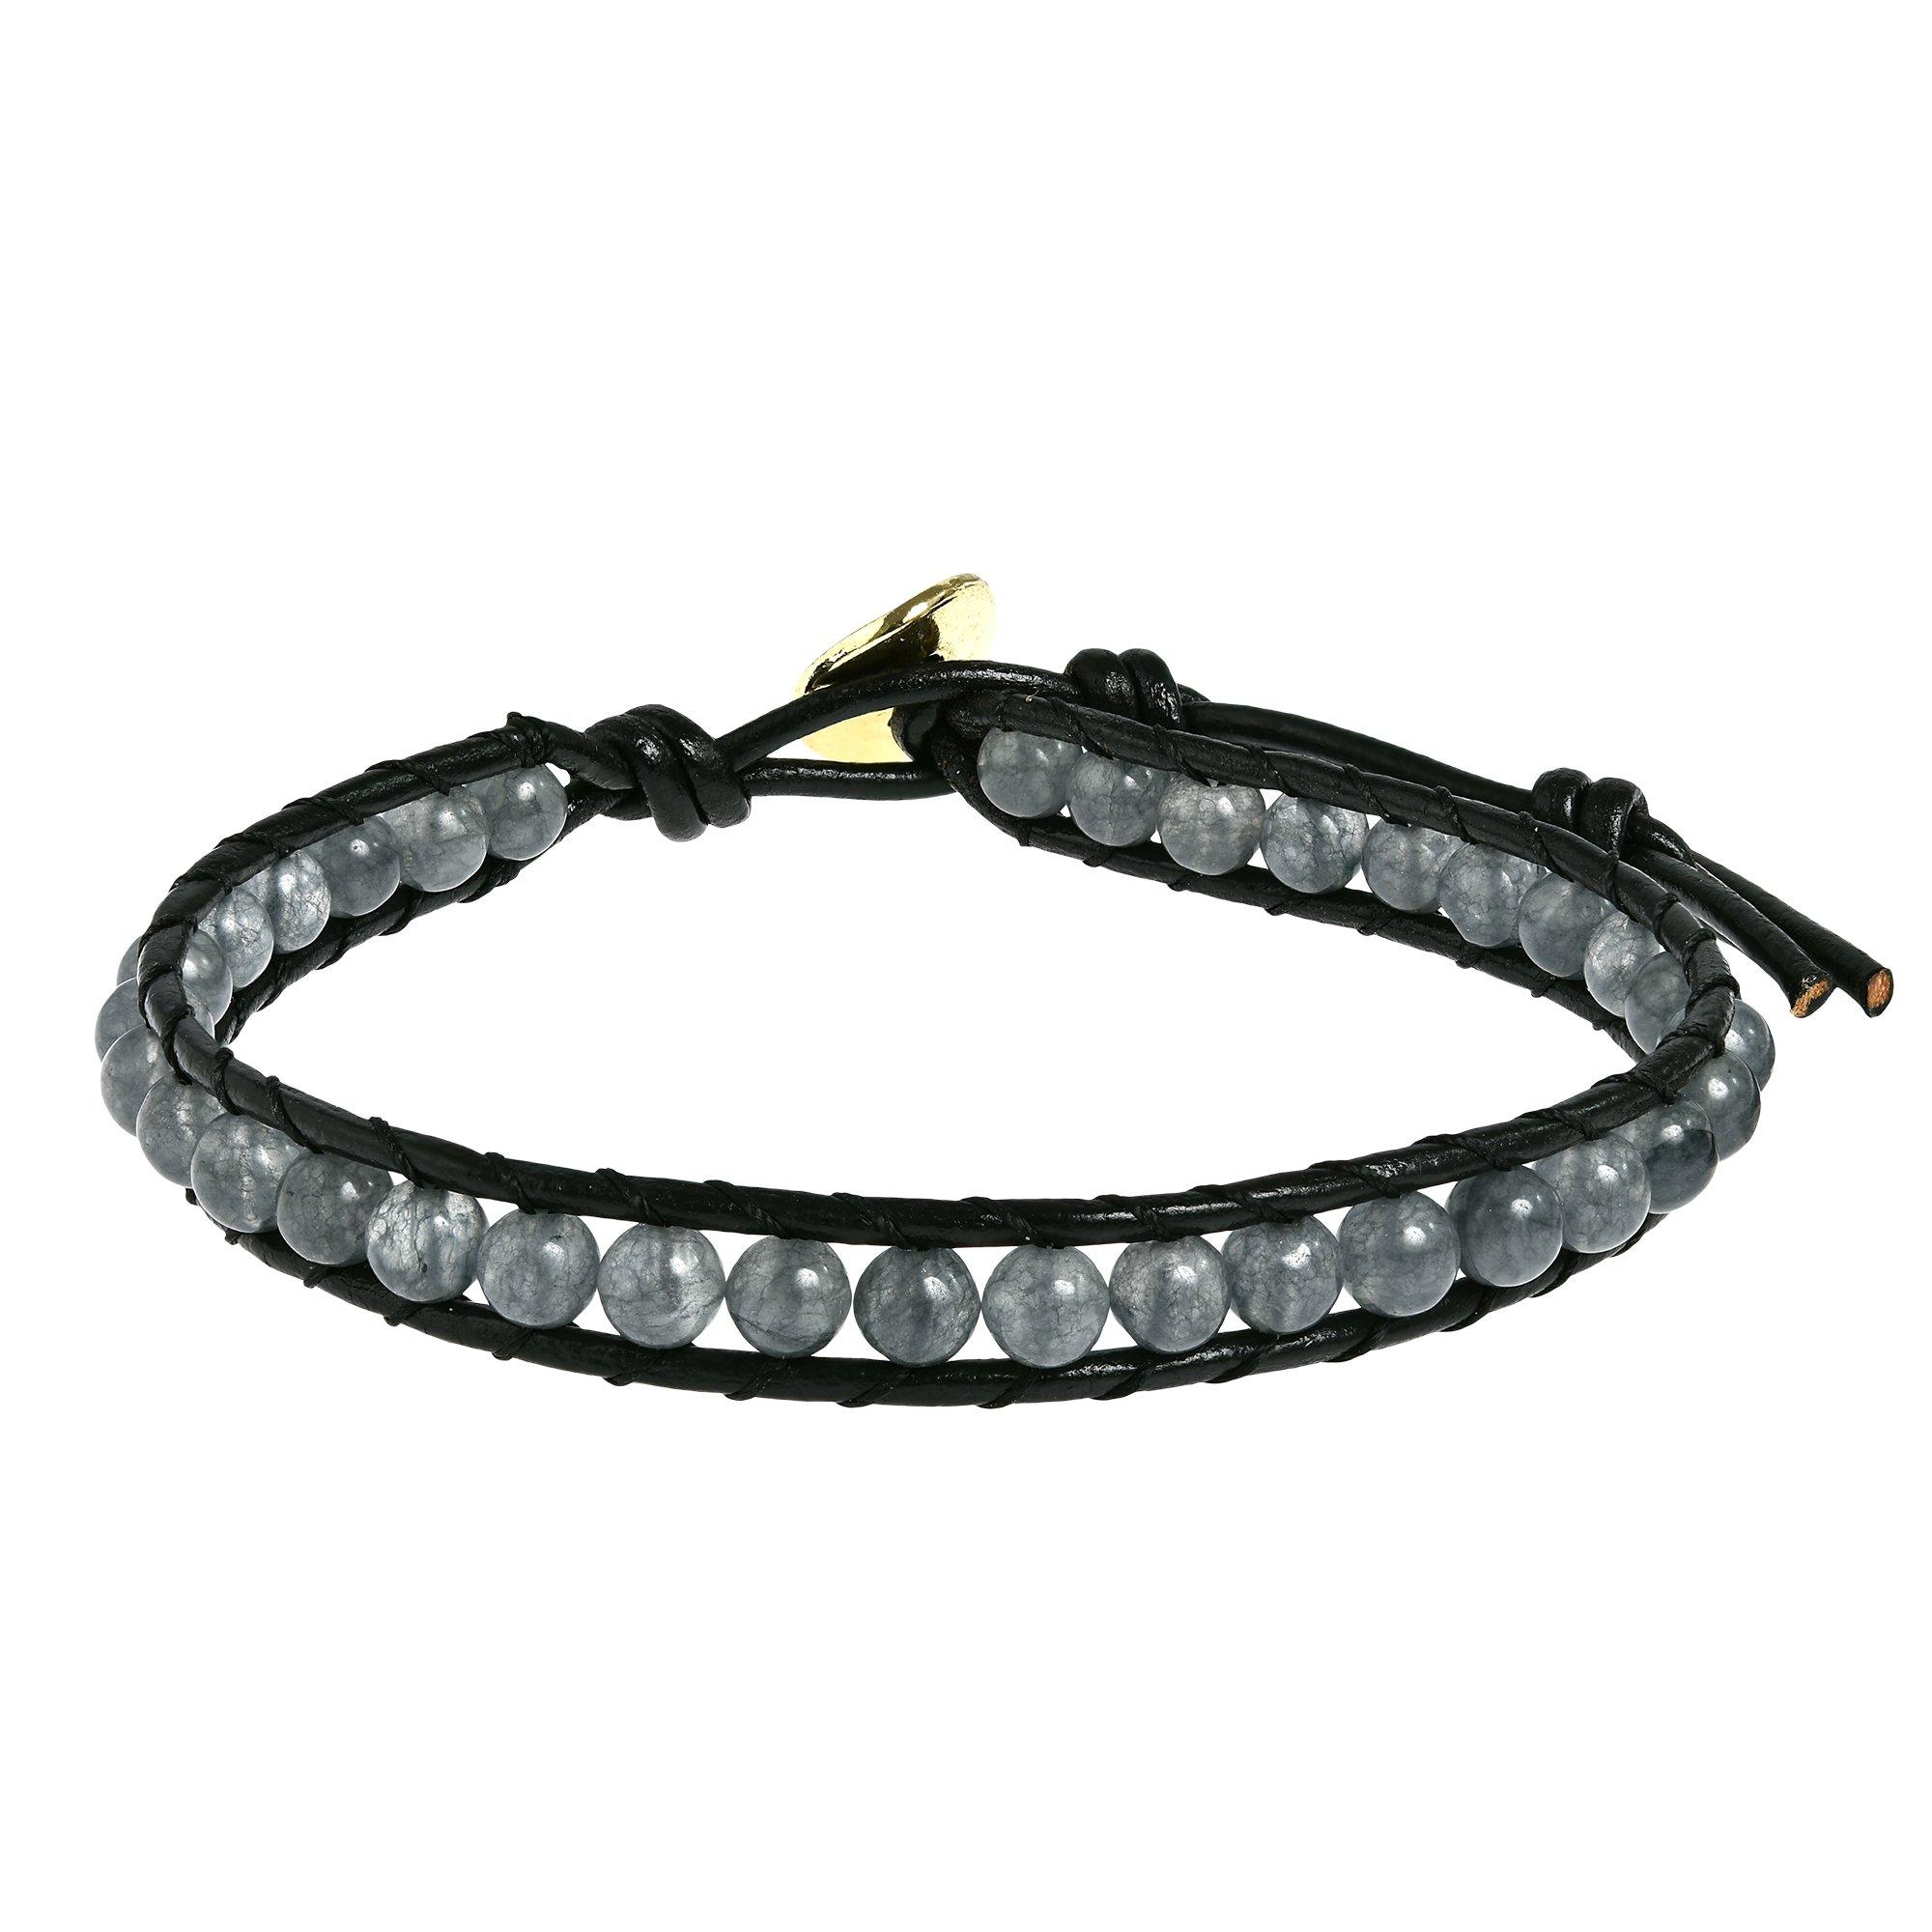 AeraVida Simulated Smokey Quartz Round Charm Single Strand Leather Bracelet